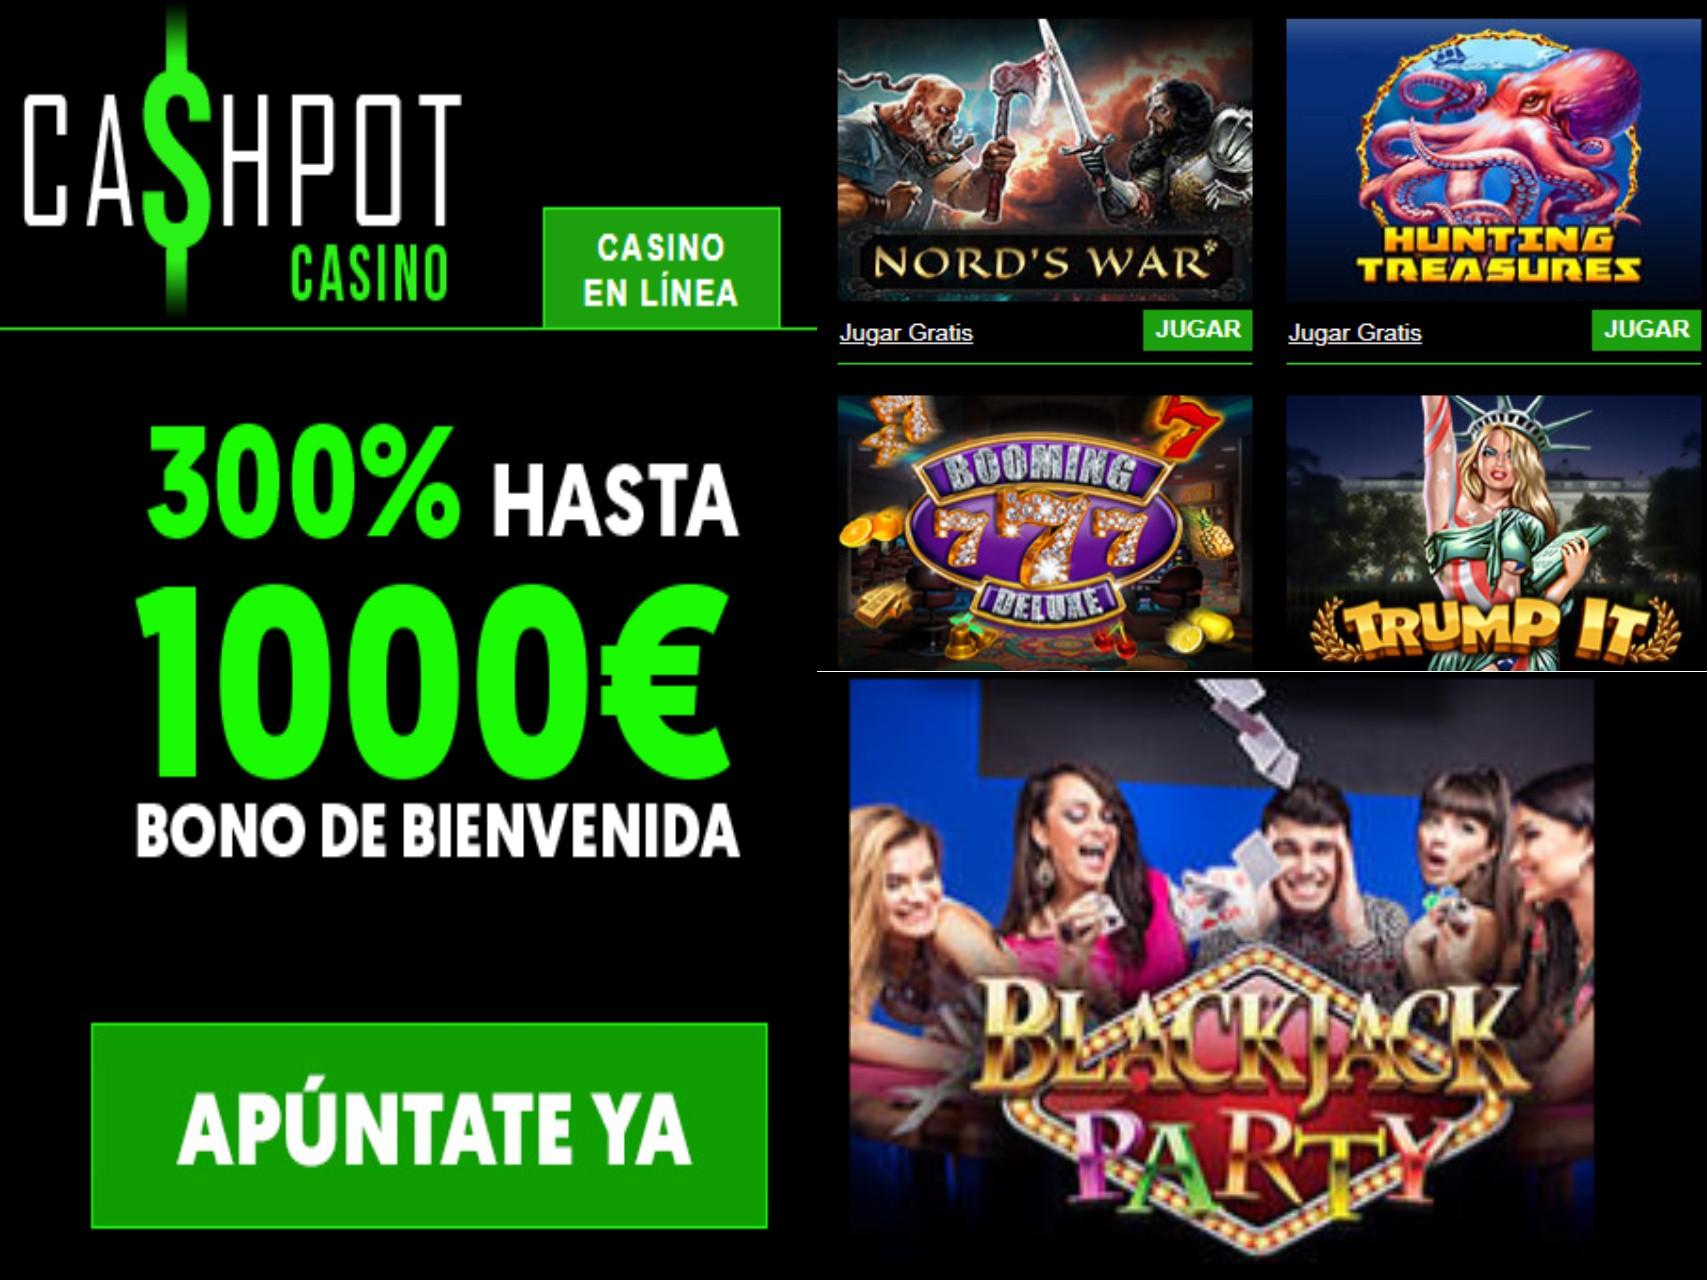 Casino Cashpot entrega hasta 1000 euros por bono de bienvenida